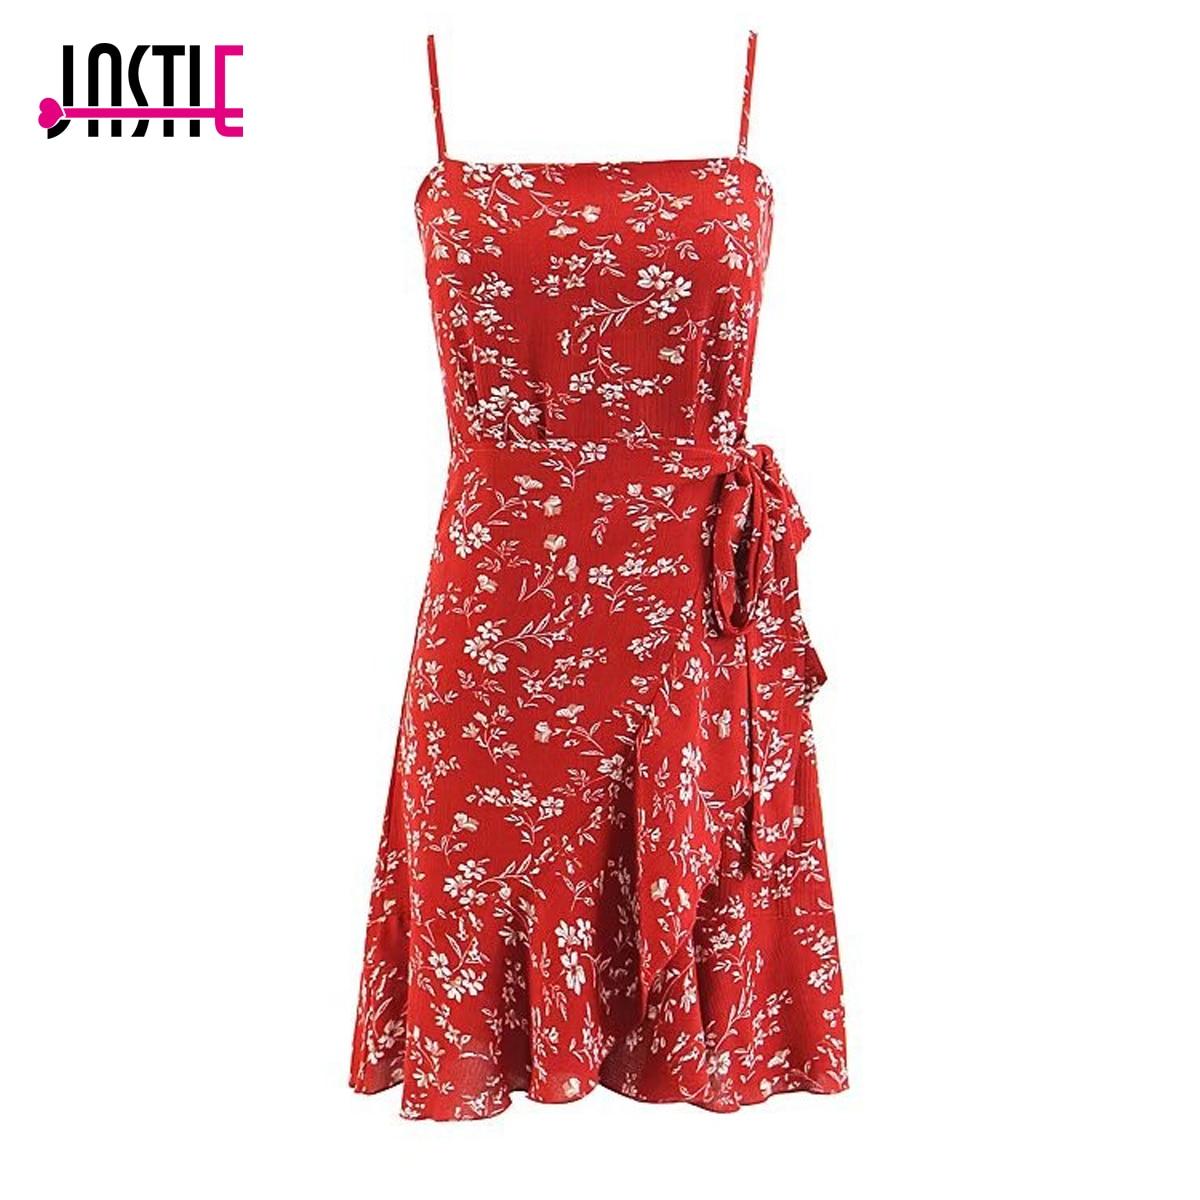 b11a39f919c Jastie Floral Print Dress Sleeveless Spaghetti Strap Dresses Boho Chic  Ruffle Hem Mini Dress 2018 Summer Women Dresses Vestidos-in Dresses from  Women s ...